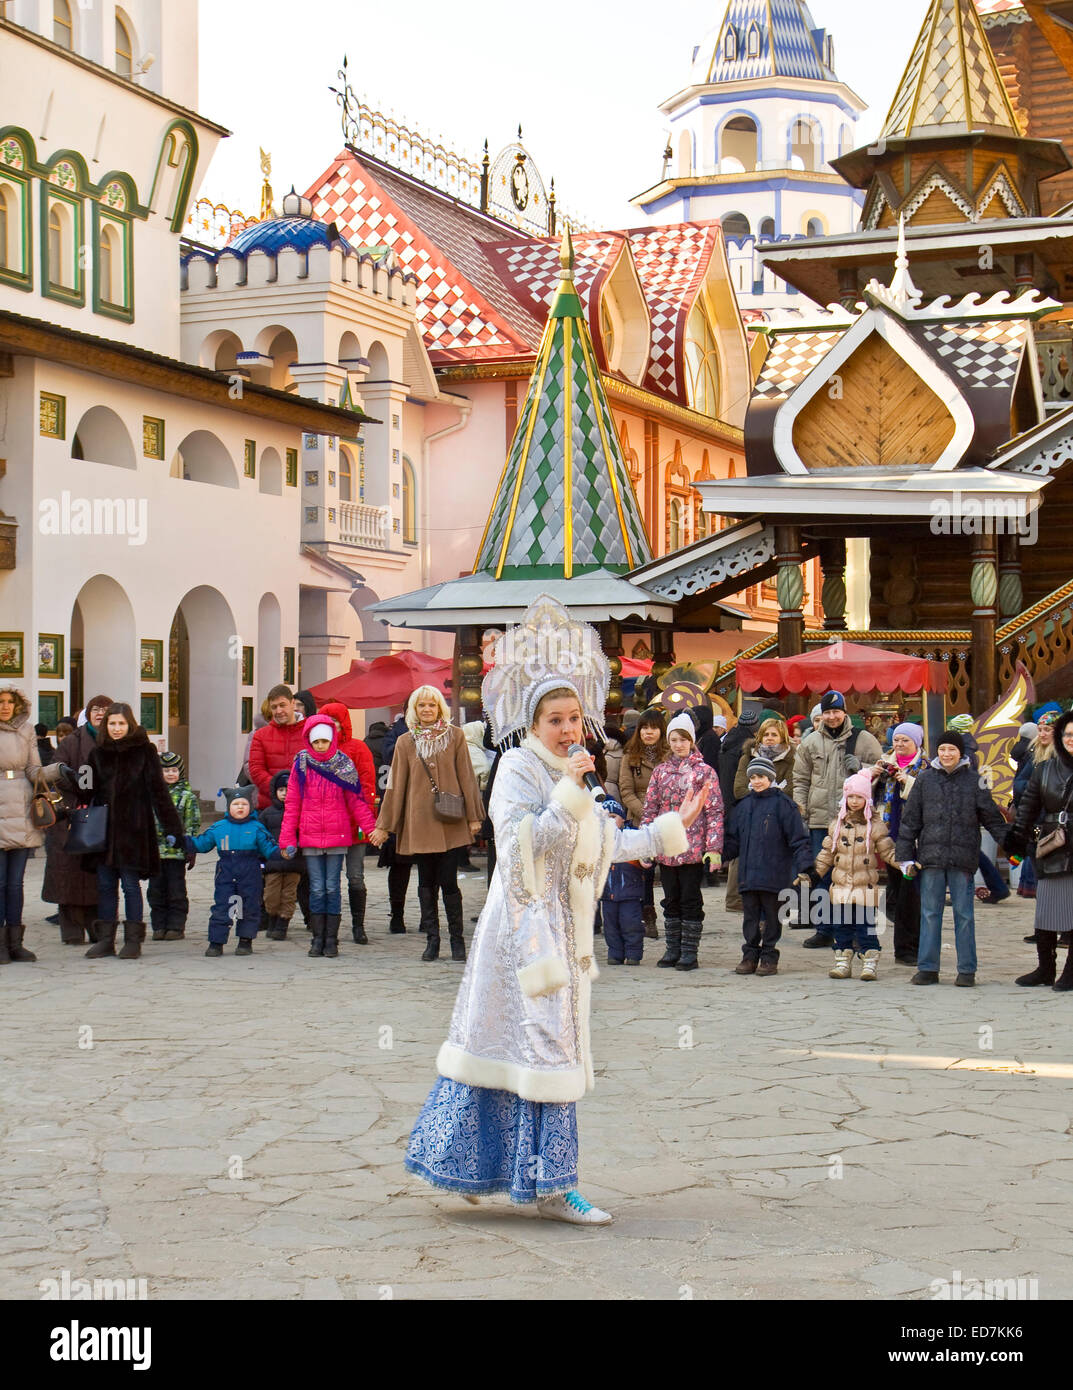 Yoroslavl, pancakes optimists and dress of pancakes